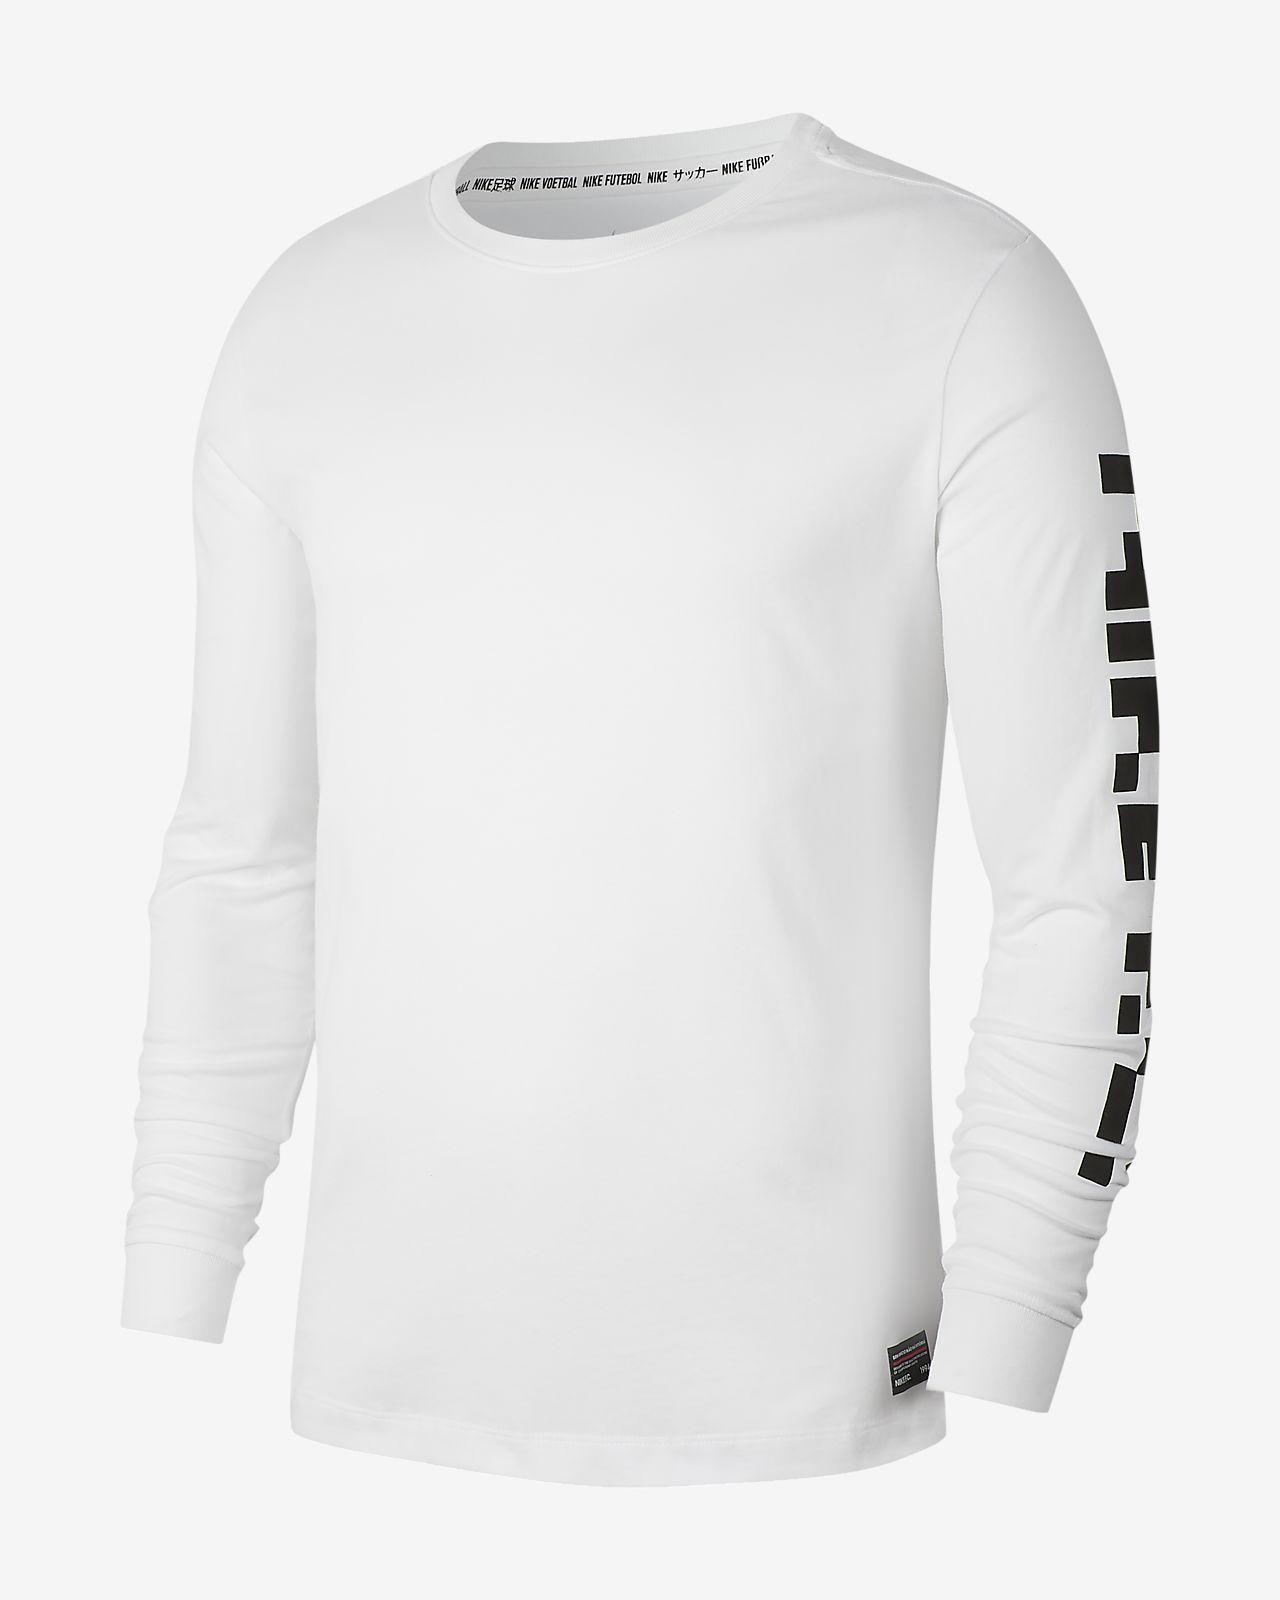 Nike Dri-FIT F.C. Men's Long-Sleeve Soccer T-Shirt